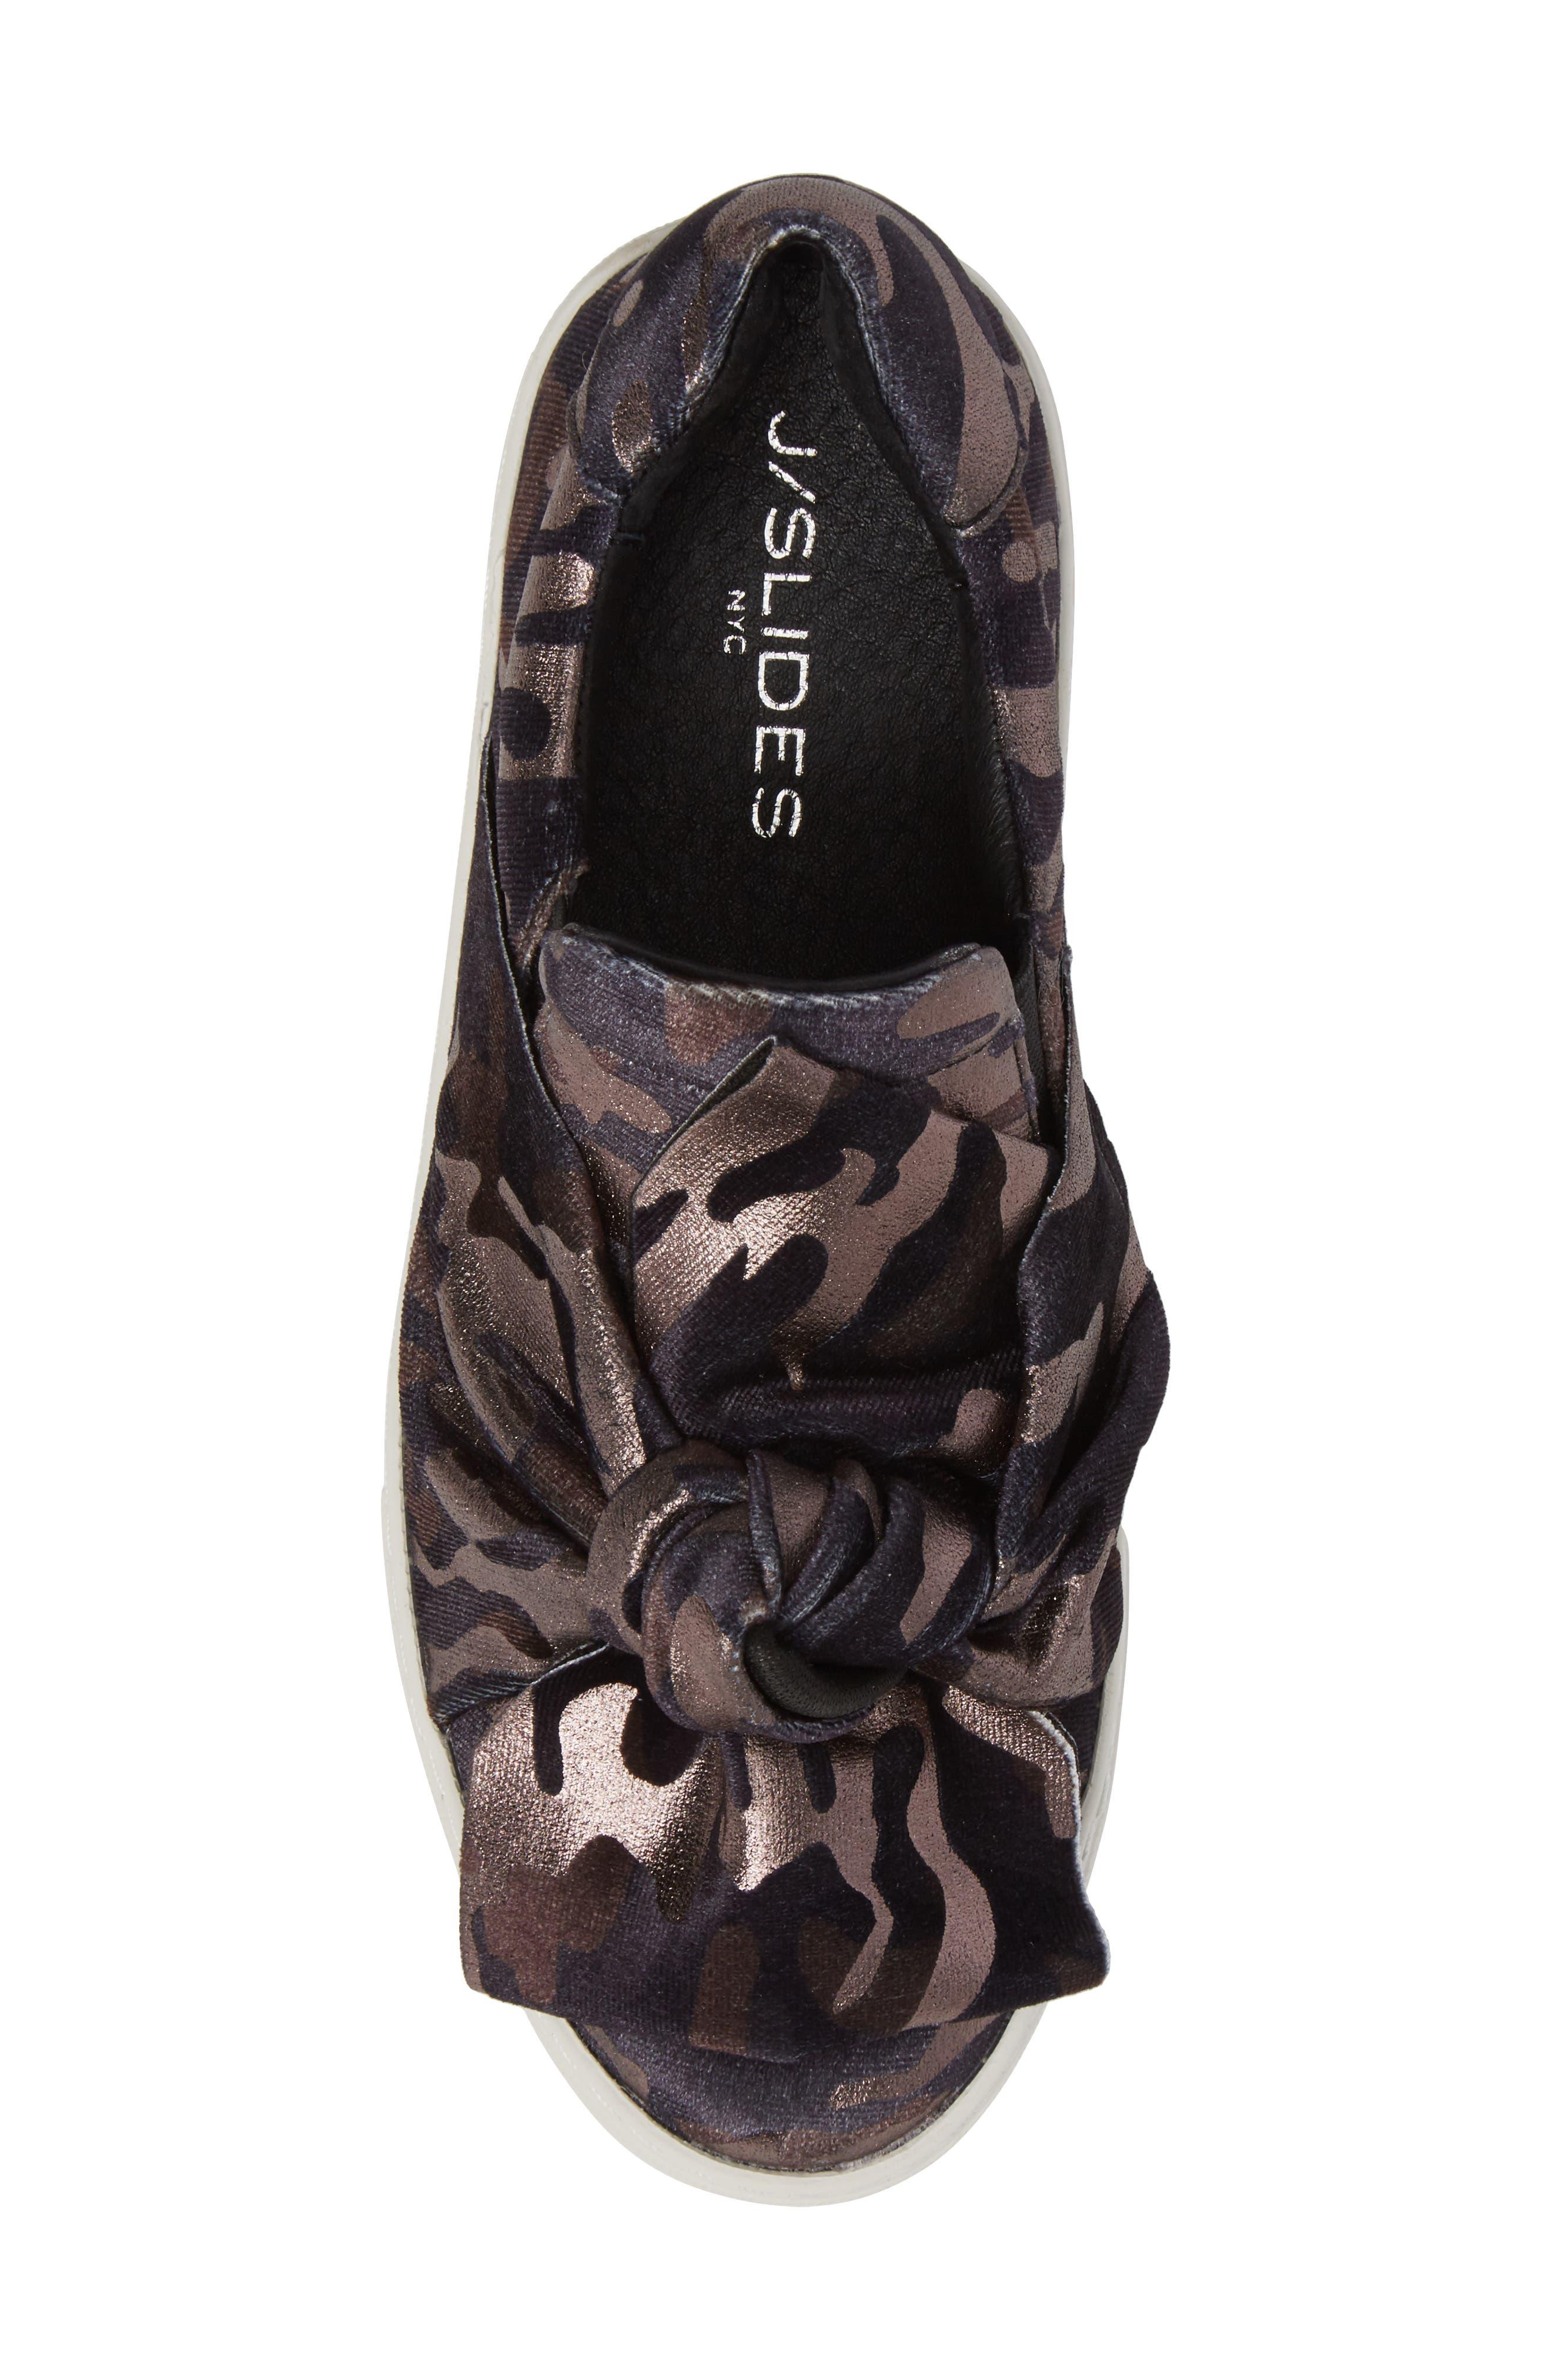 Audra Slip-On Sneaker,                             Alternate thumbnail 5, color,                             Black Camo Fabric